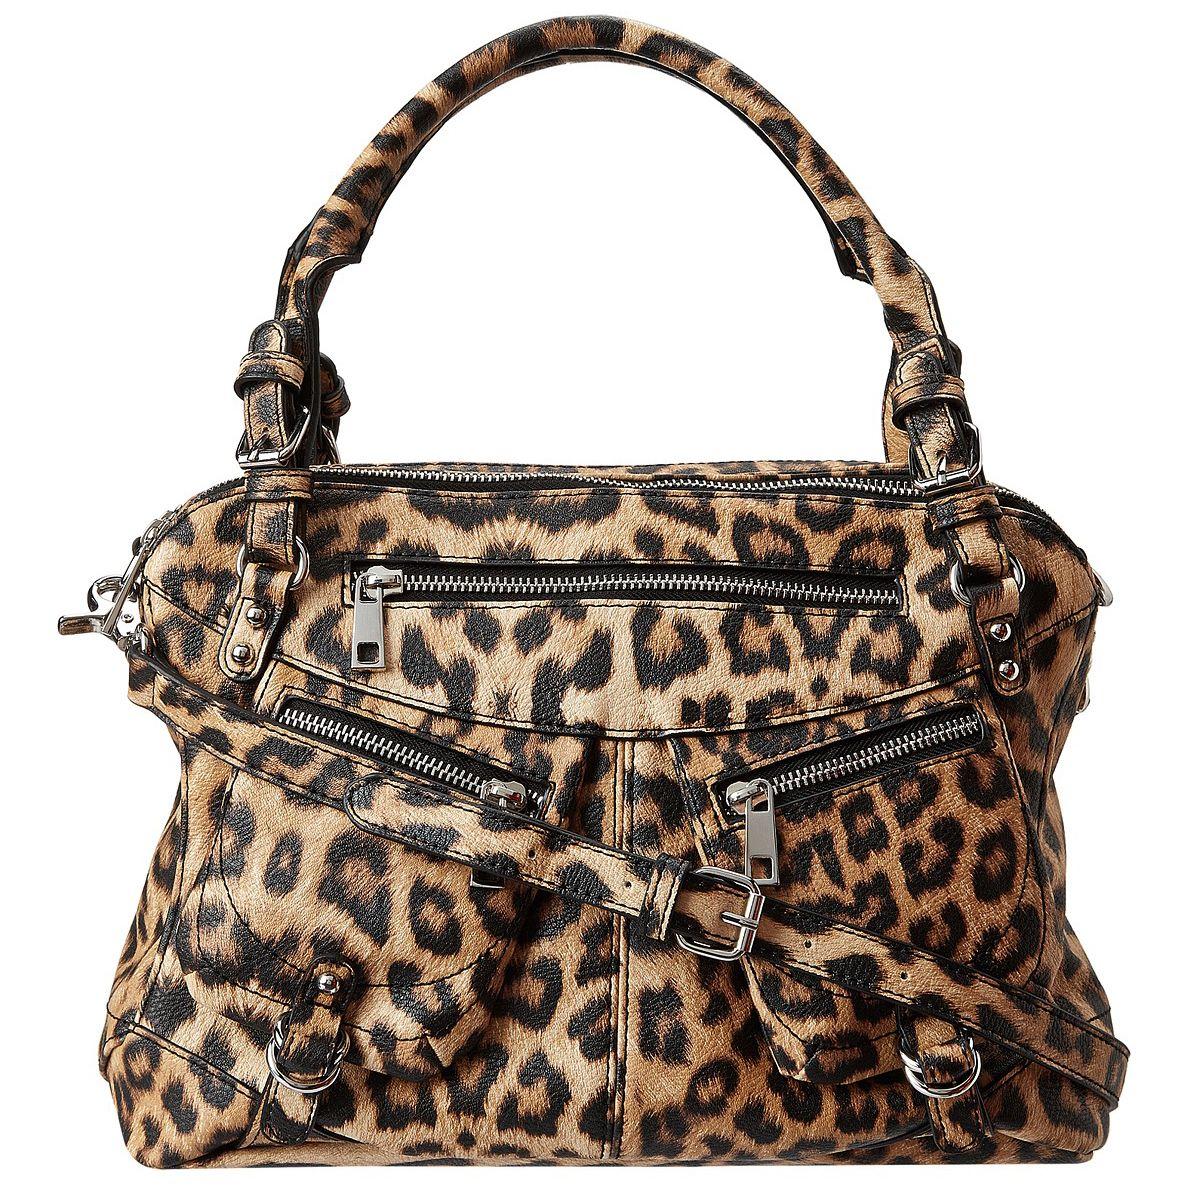 534c213527f8 Jessica Simpson Saskia Satchel Bag-Leopard - Price  74.99